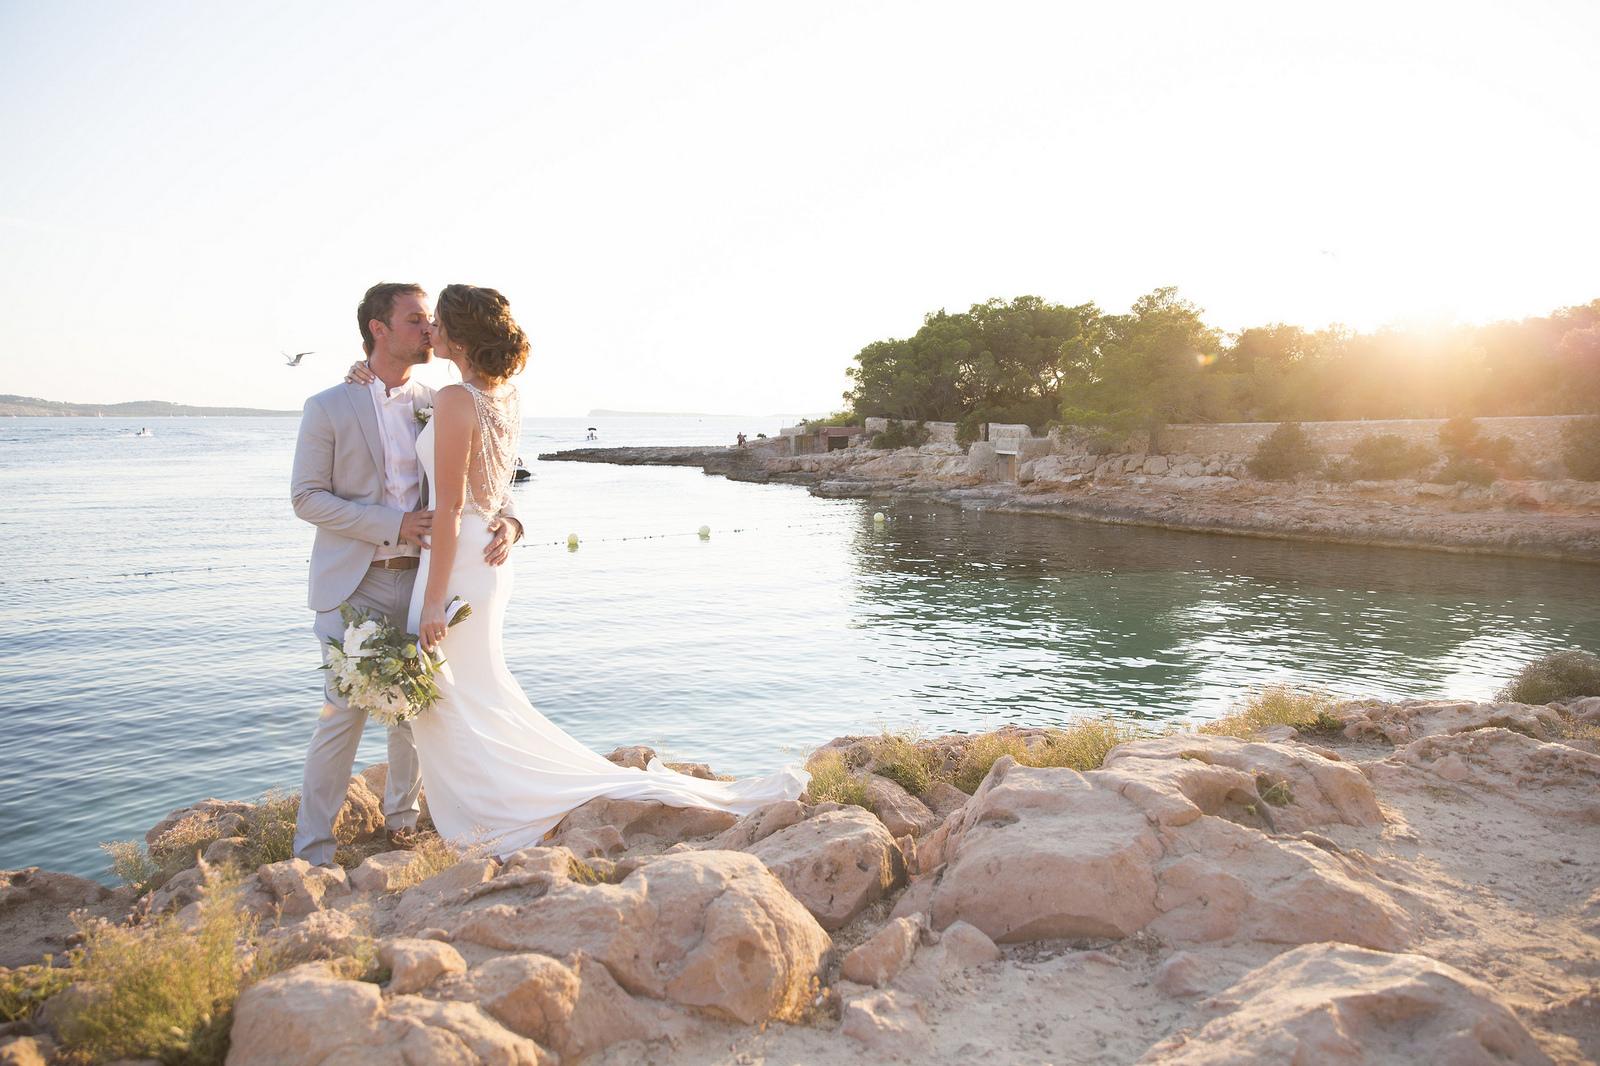 https://www.white-ibiza.com/wp-content/uploads/2020/03/ibiza-weddings-cala-gracioneta-chiringuito-2018-13.jpg